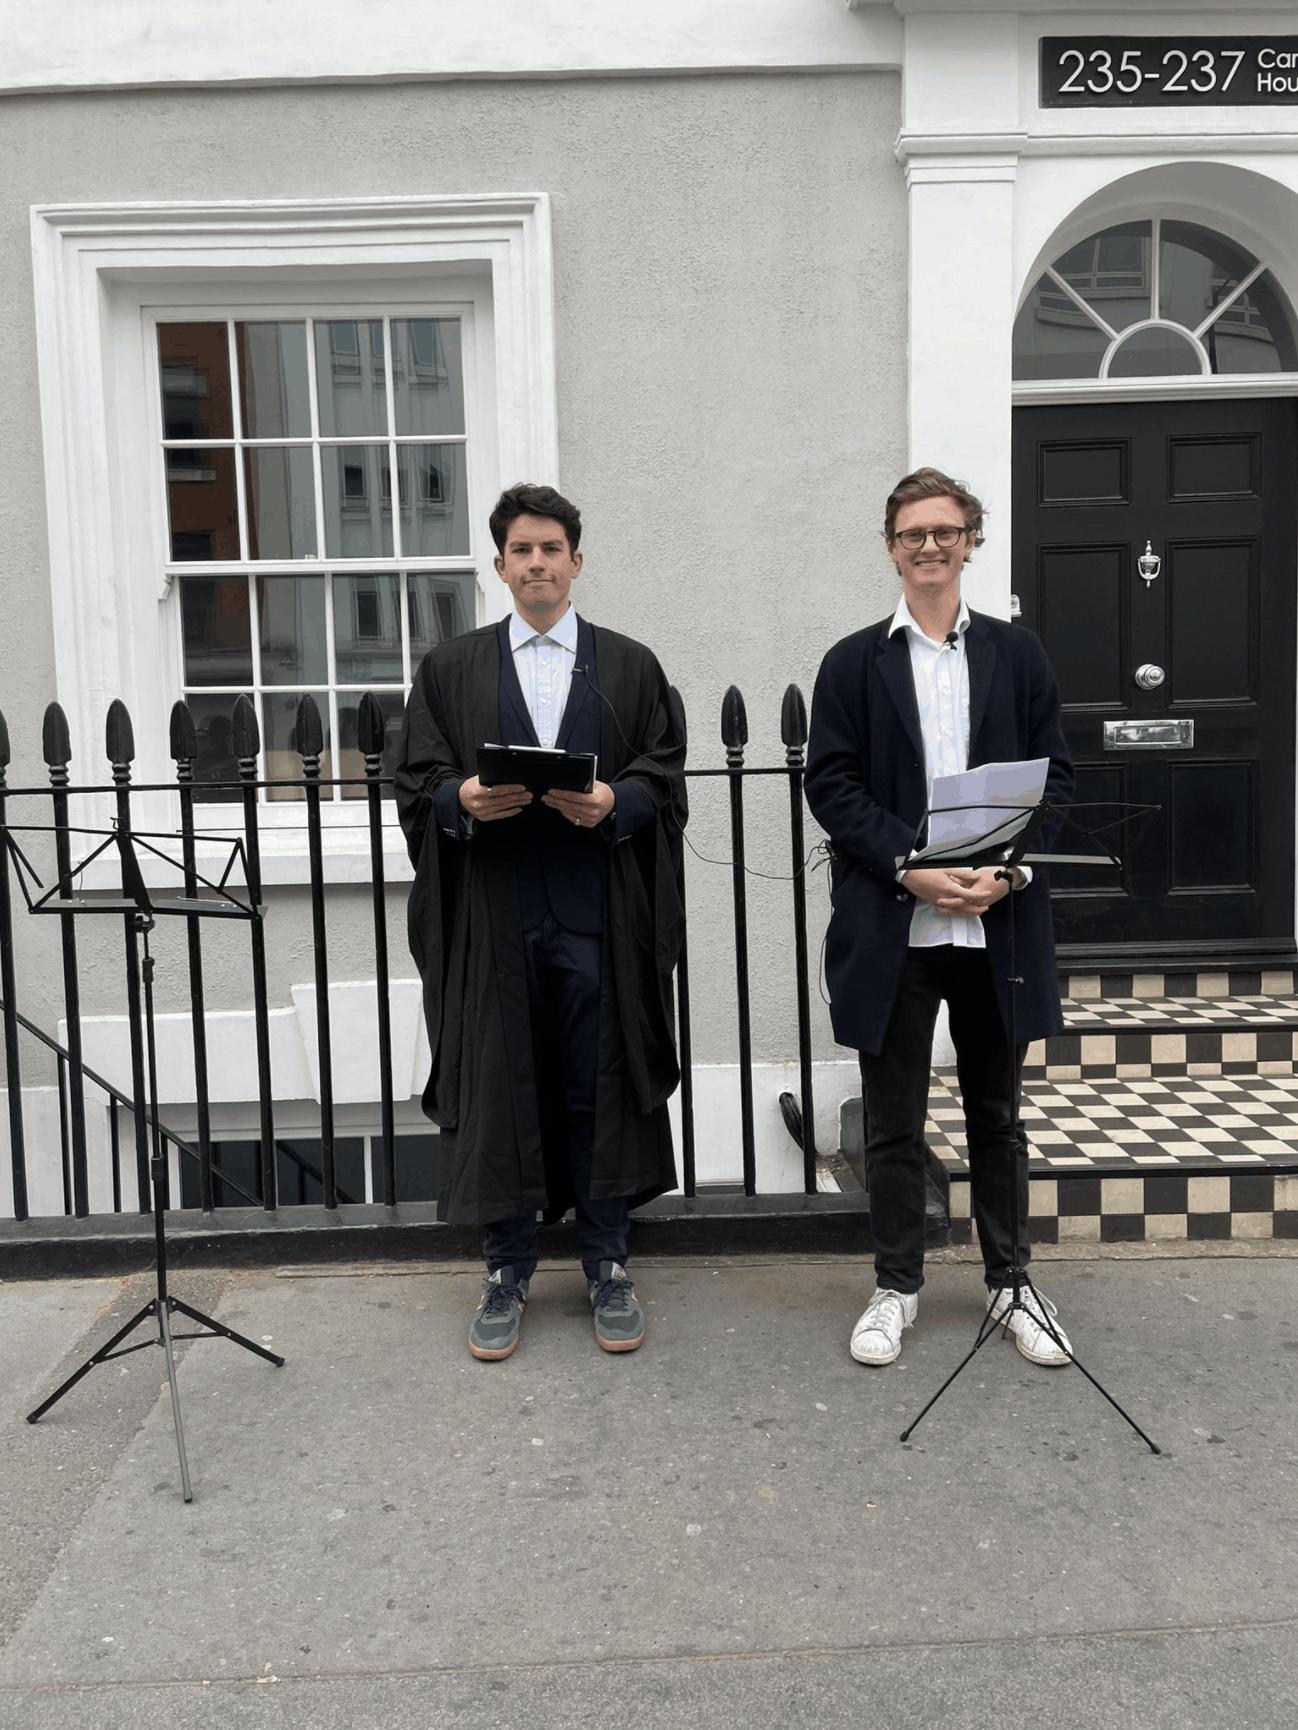 Max Fosh (right) waiting to debate Laurence Fox